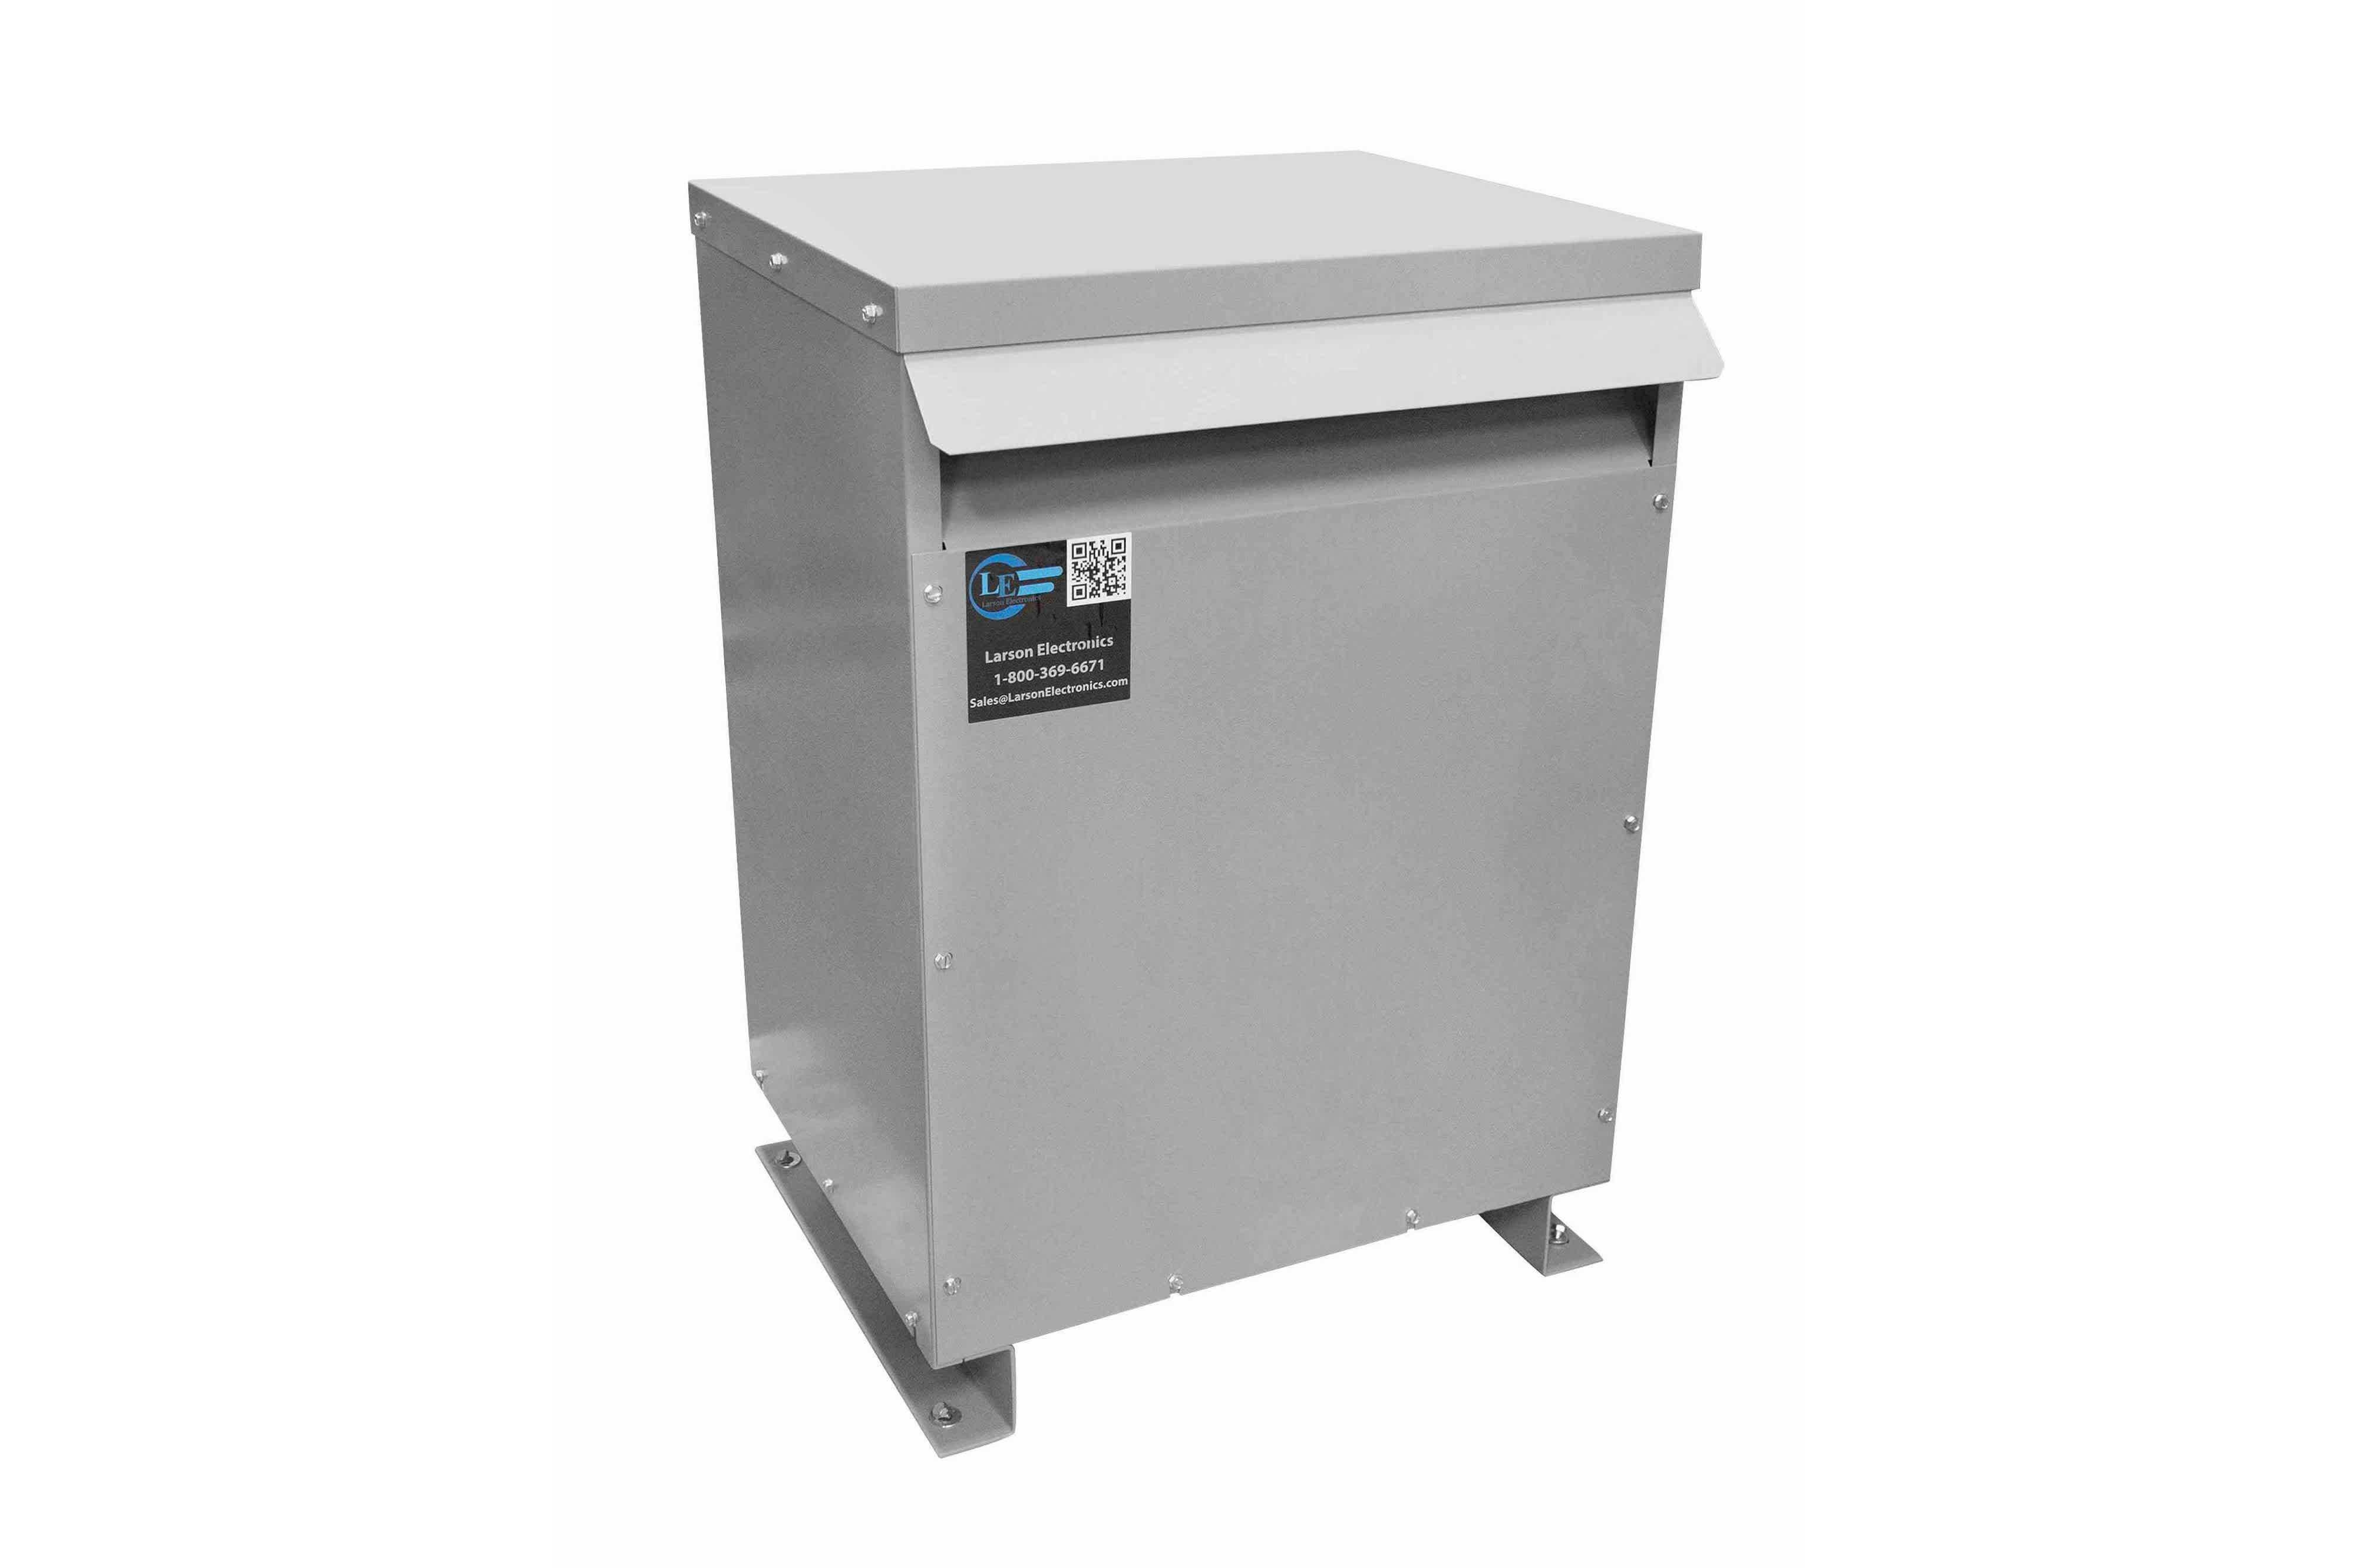 26 kVA 3PH Isolation Transformer, 240V Wye Primary, 600Y/347 Wye-N Secondary, N3R, Ventilated, 60 Hz